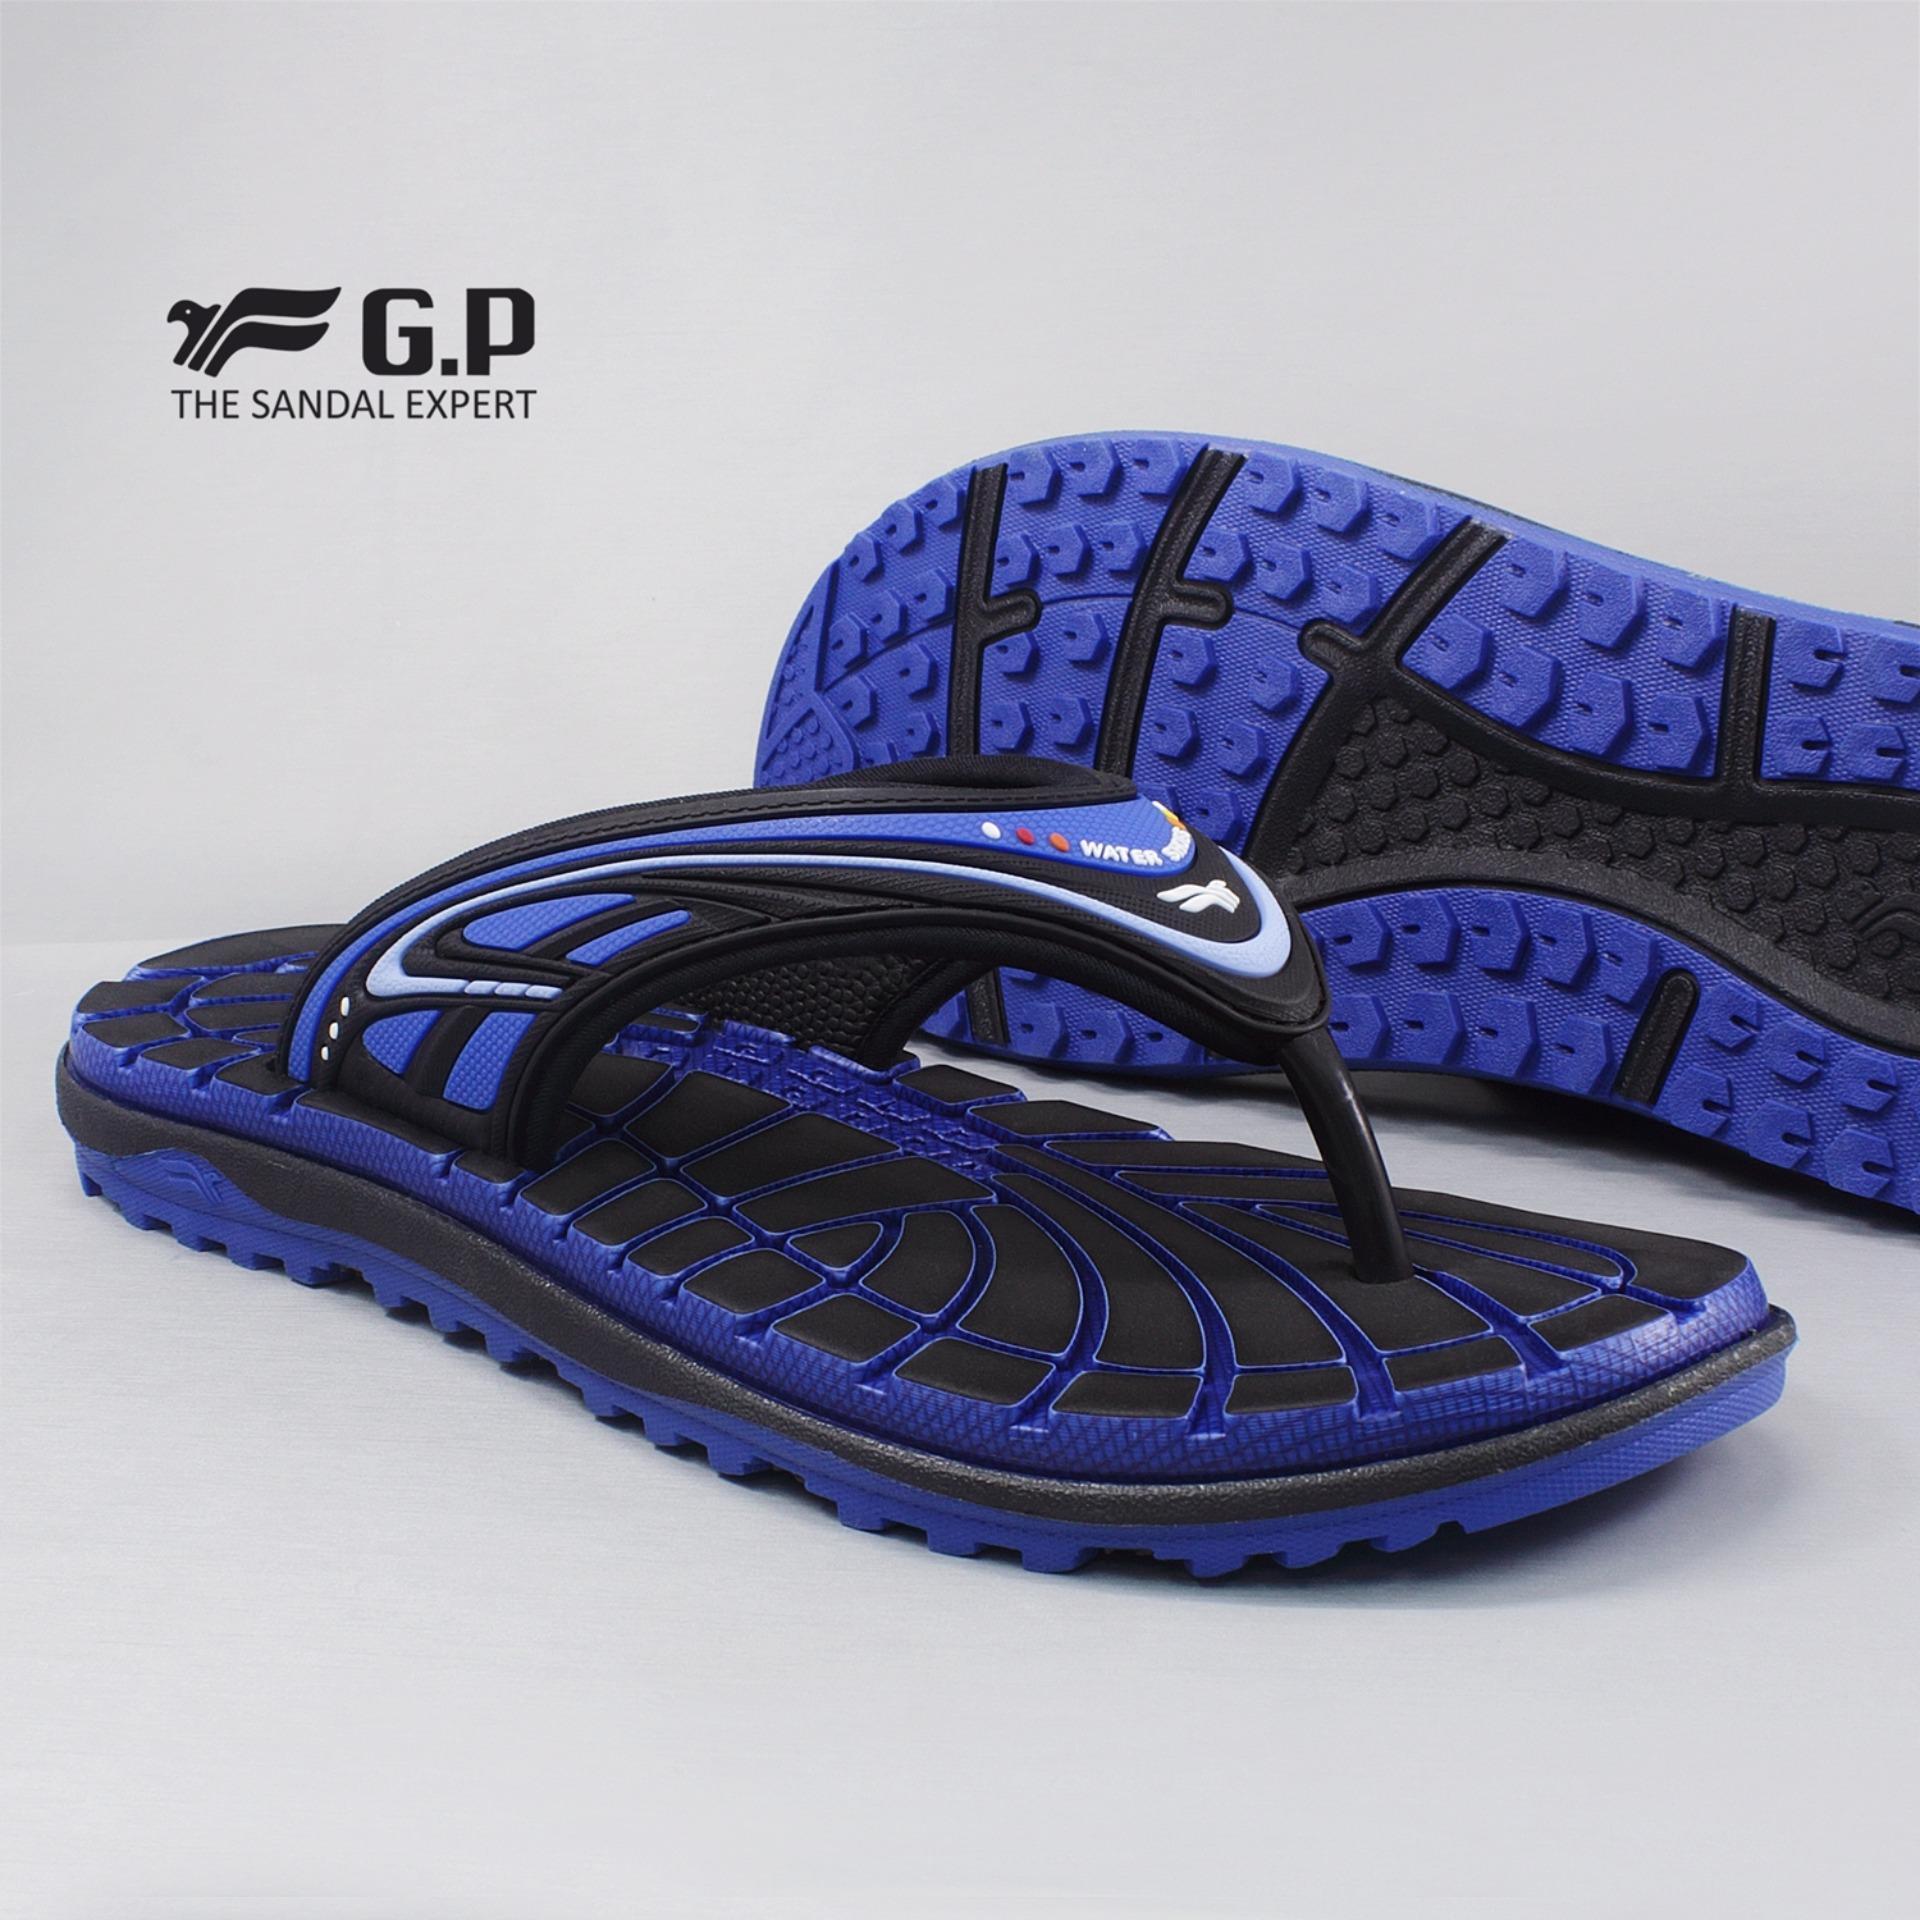 New Gp Gold Pigeon Sandal Pria Elast Blue G7591 23 Murah